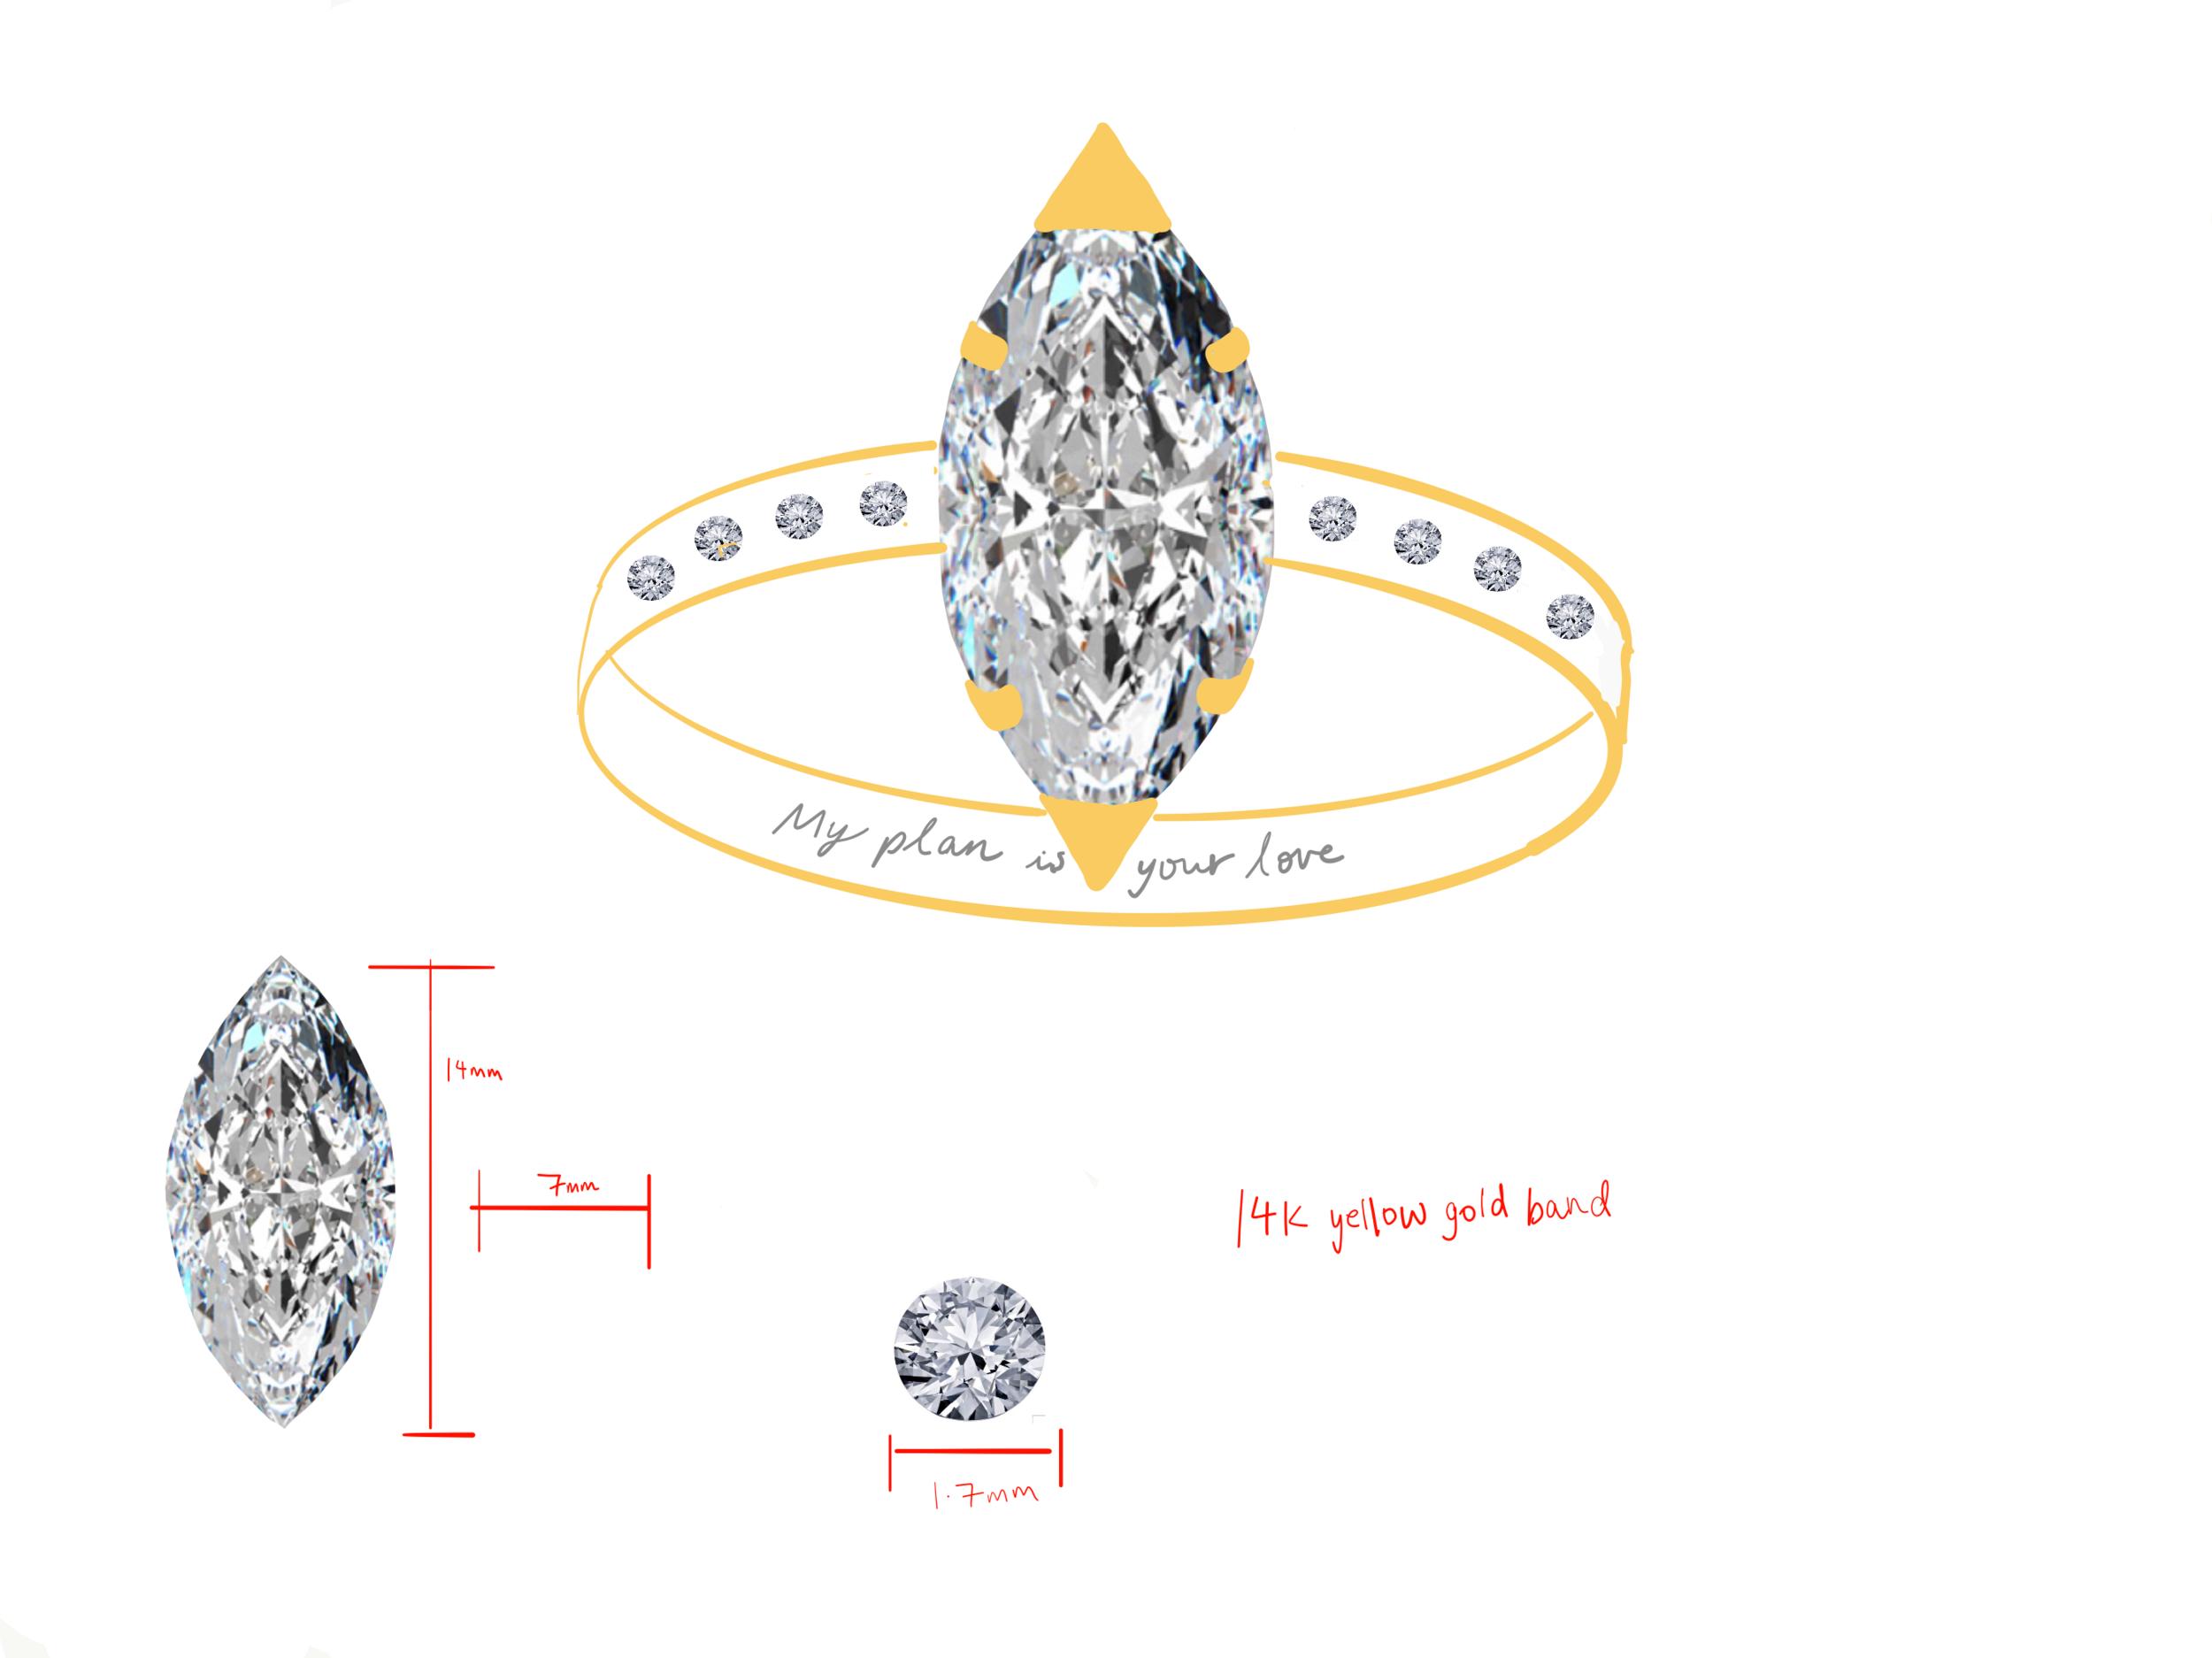 Digital jewelry designs